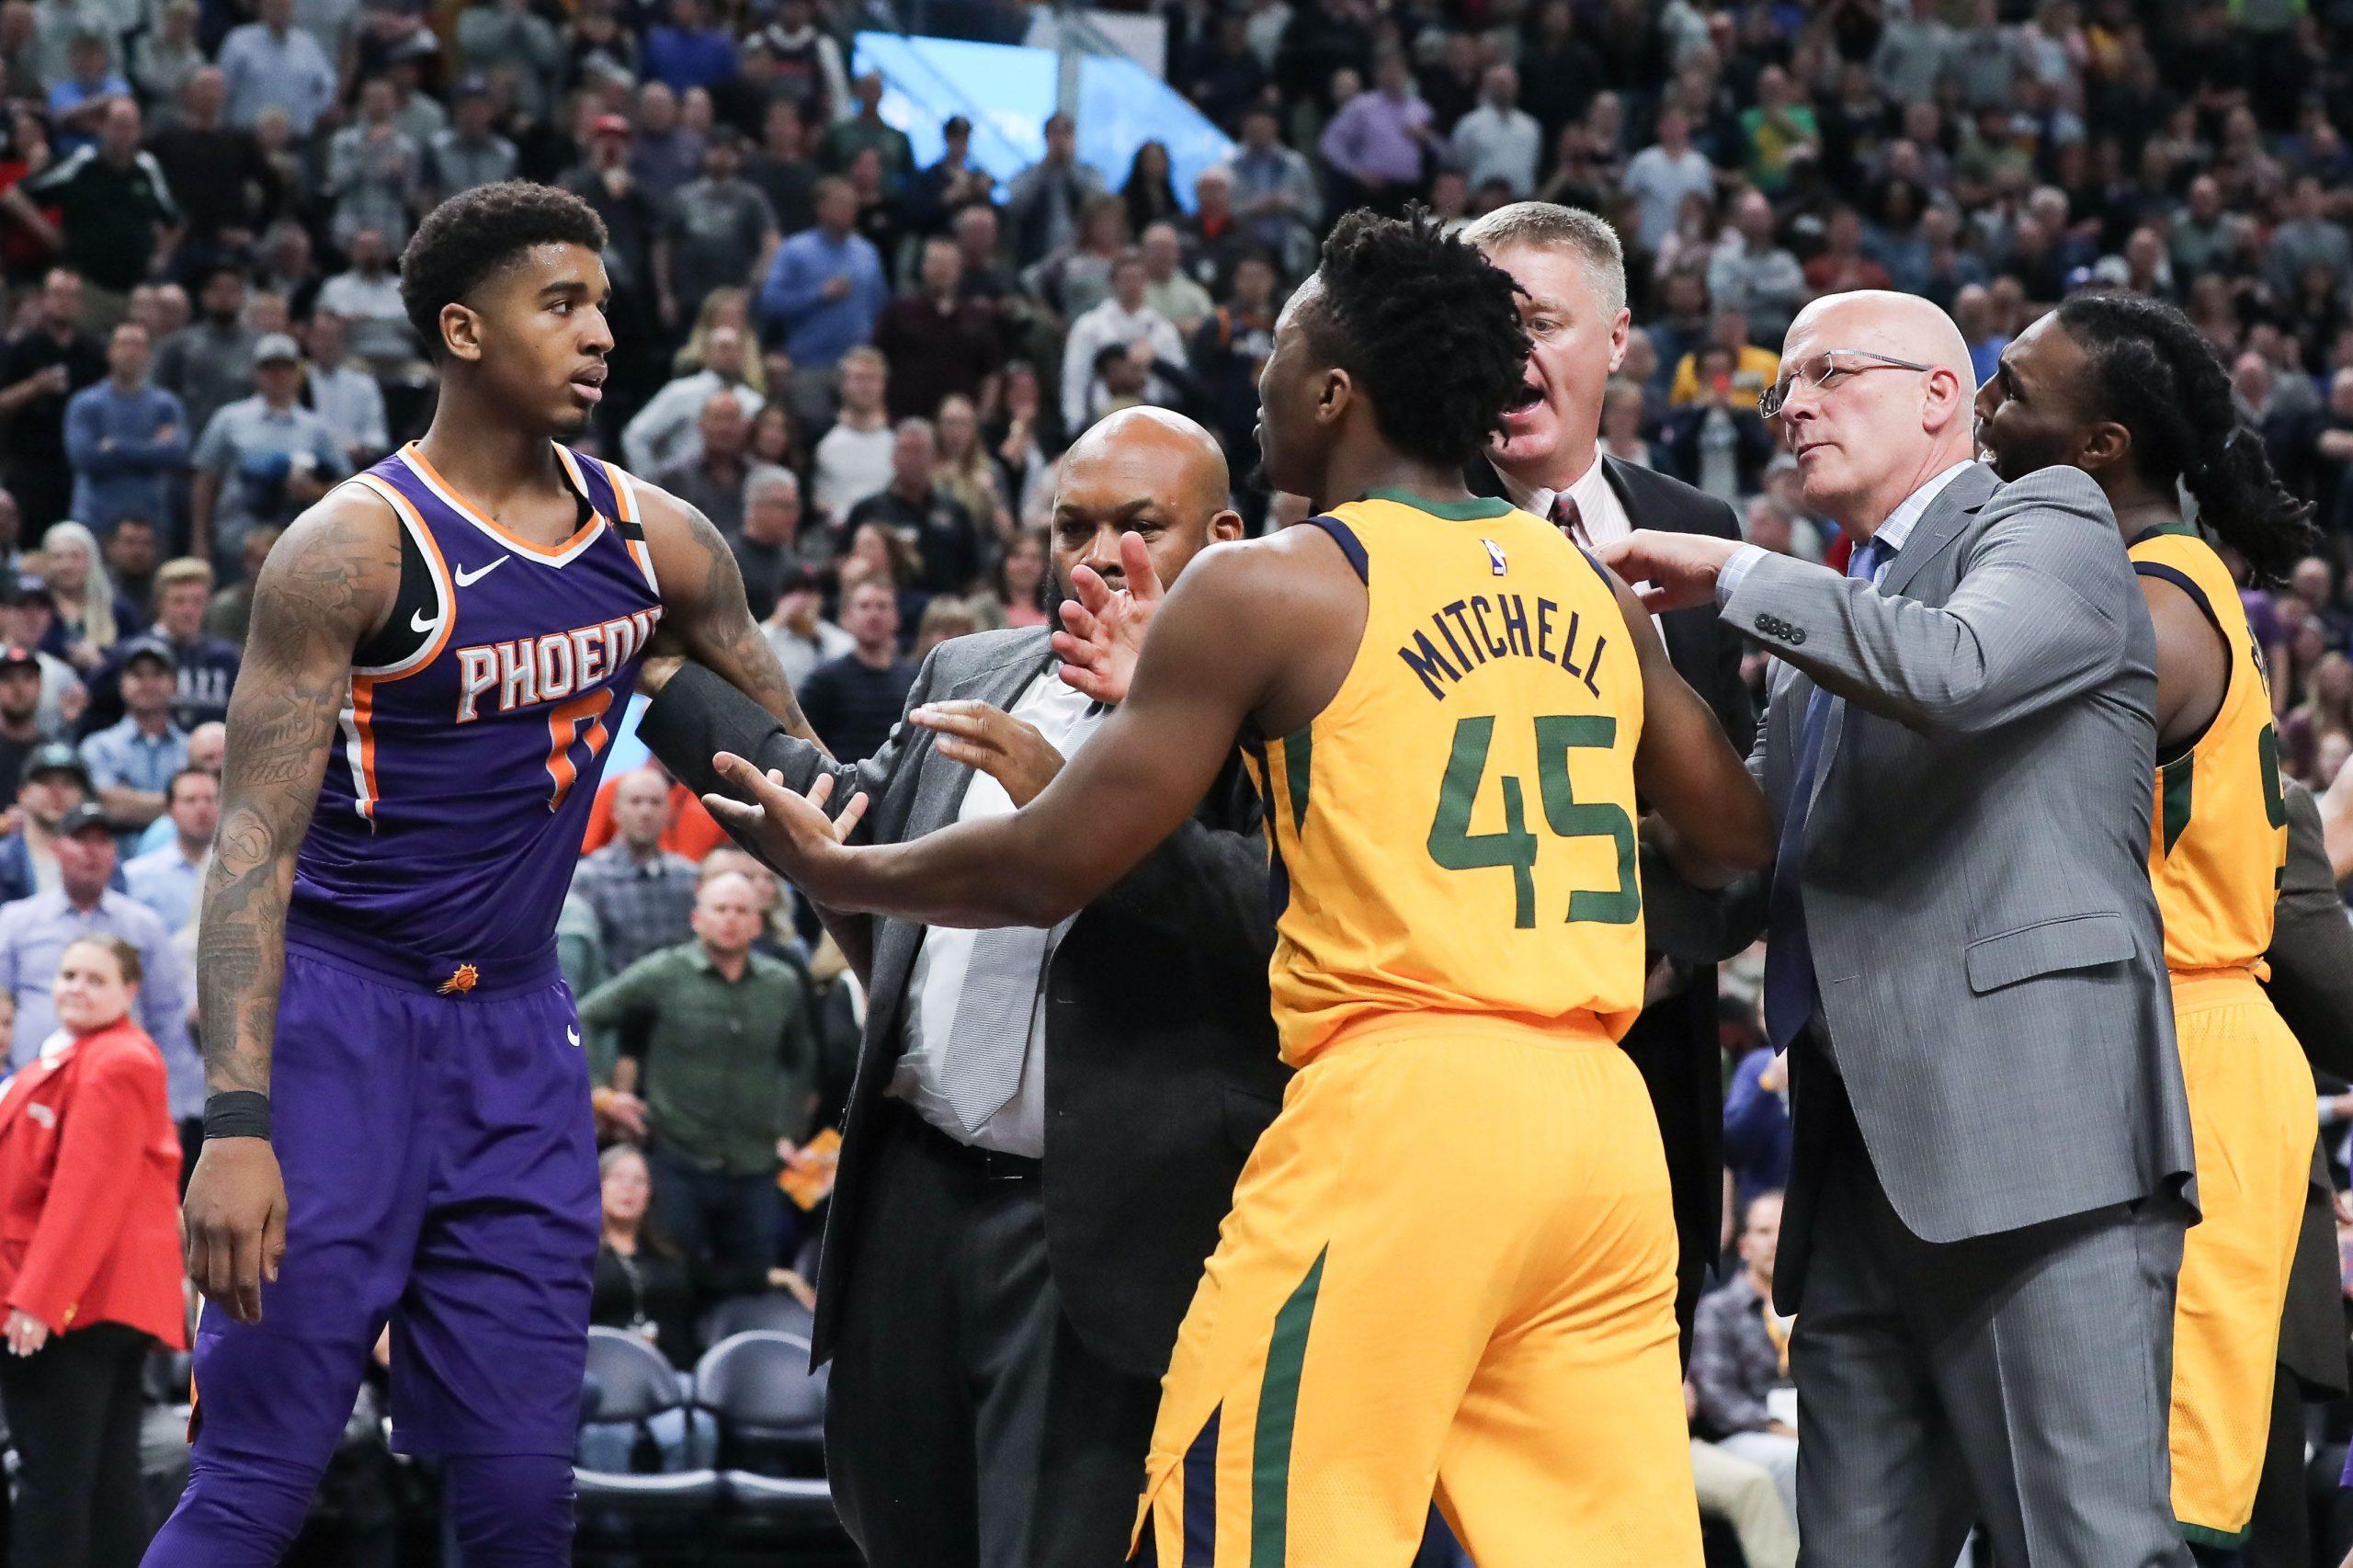 Phoenix Suns jatuh ke Utah Jazz, melampiaskan frustrasi dalam pertarungan